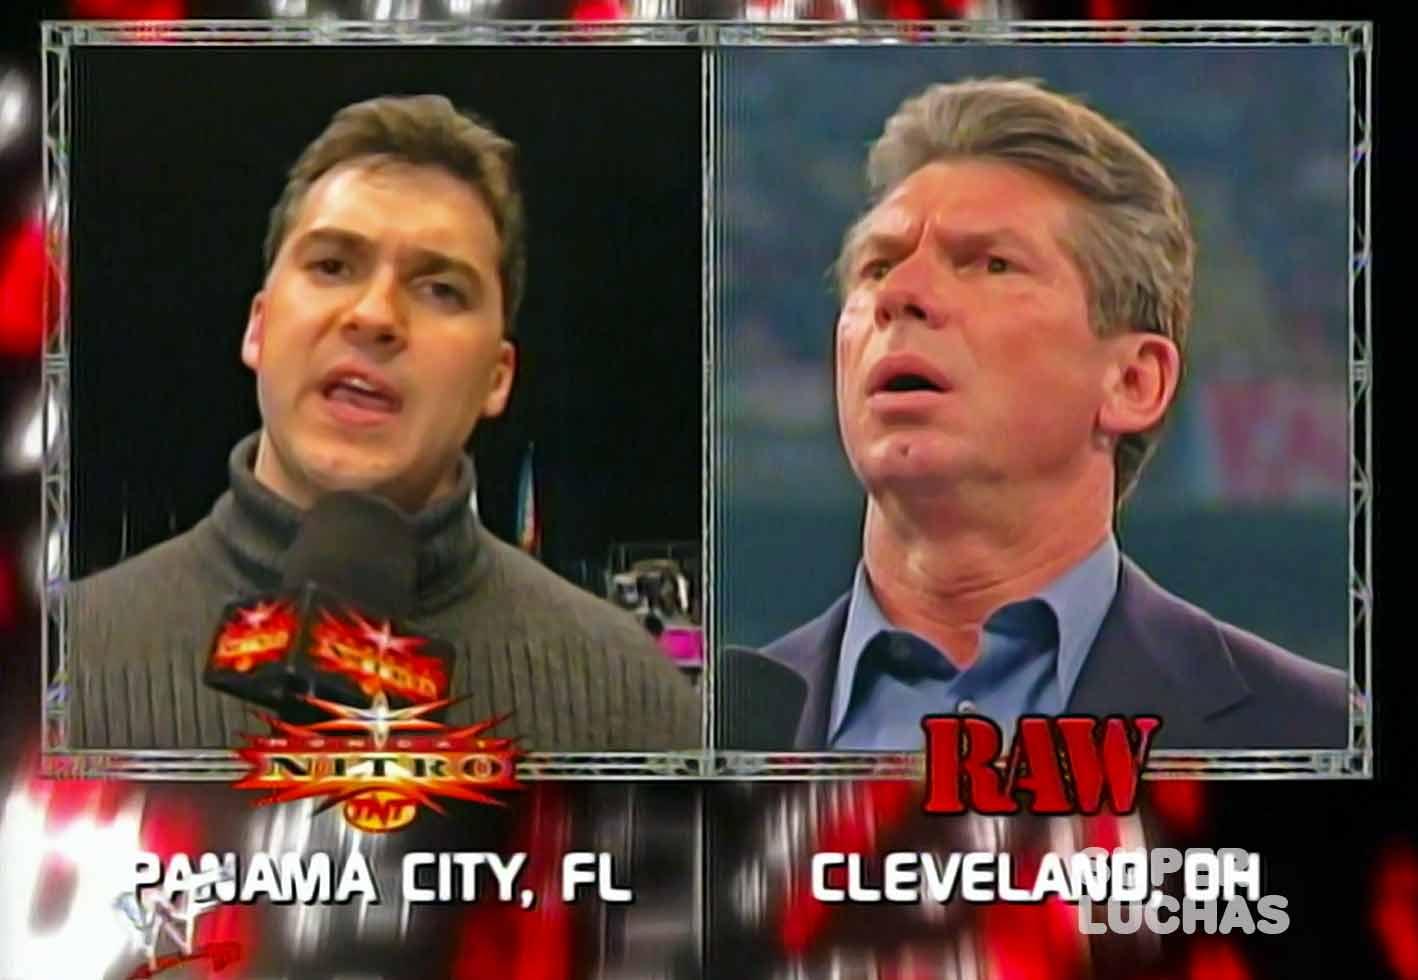 Shane Vince McMahon